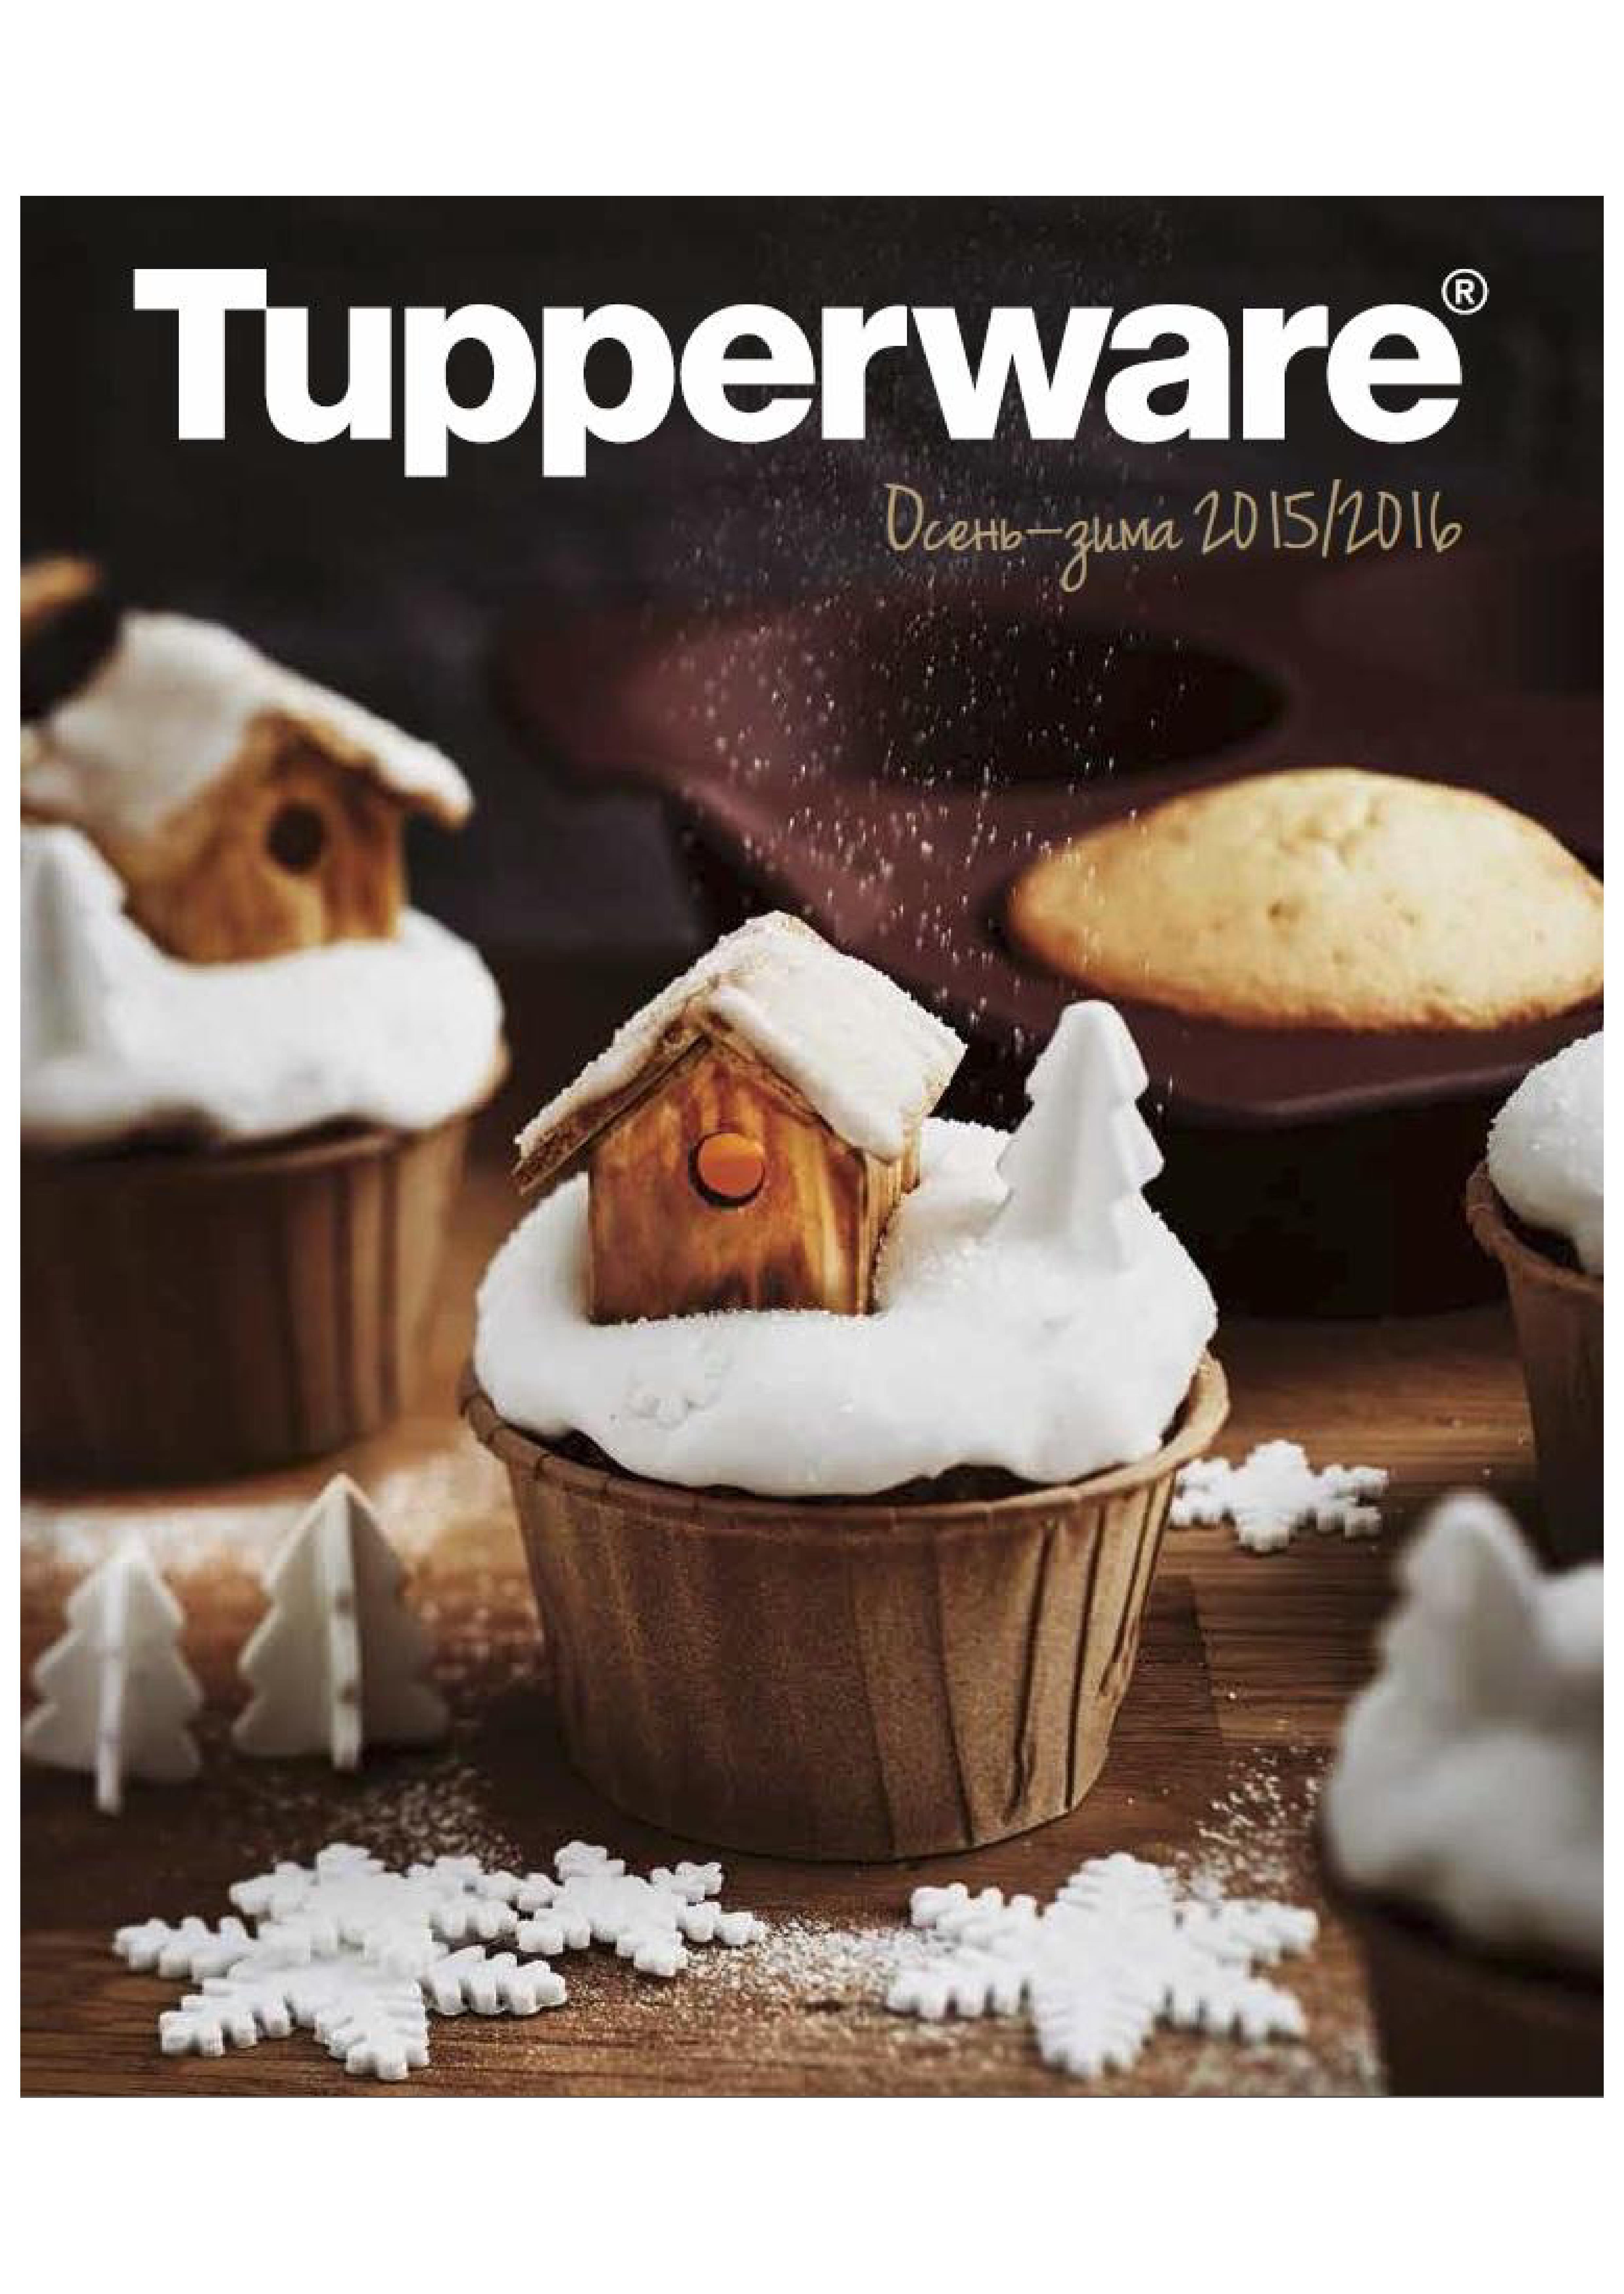 Сбор заказов. Tupperware - умная посуда для вашей кухни. Фантастика - ложка